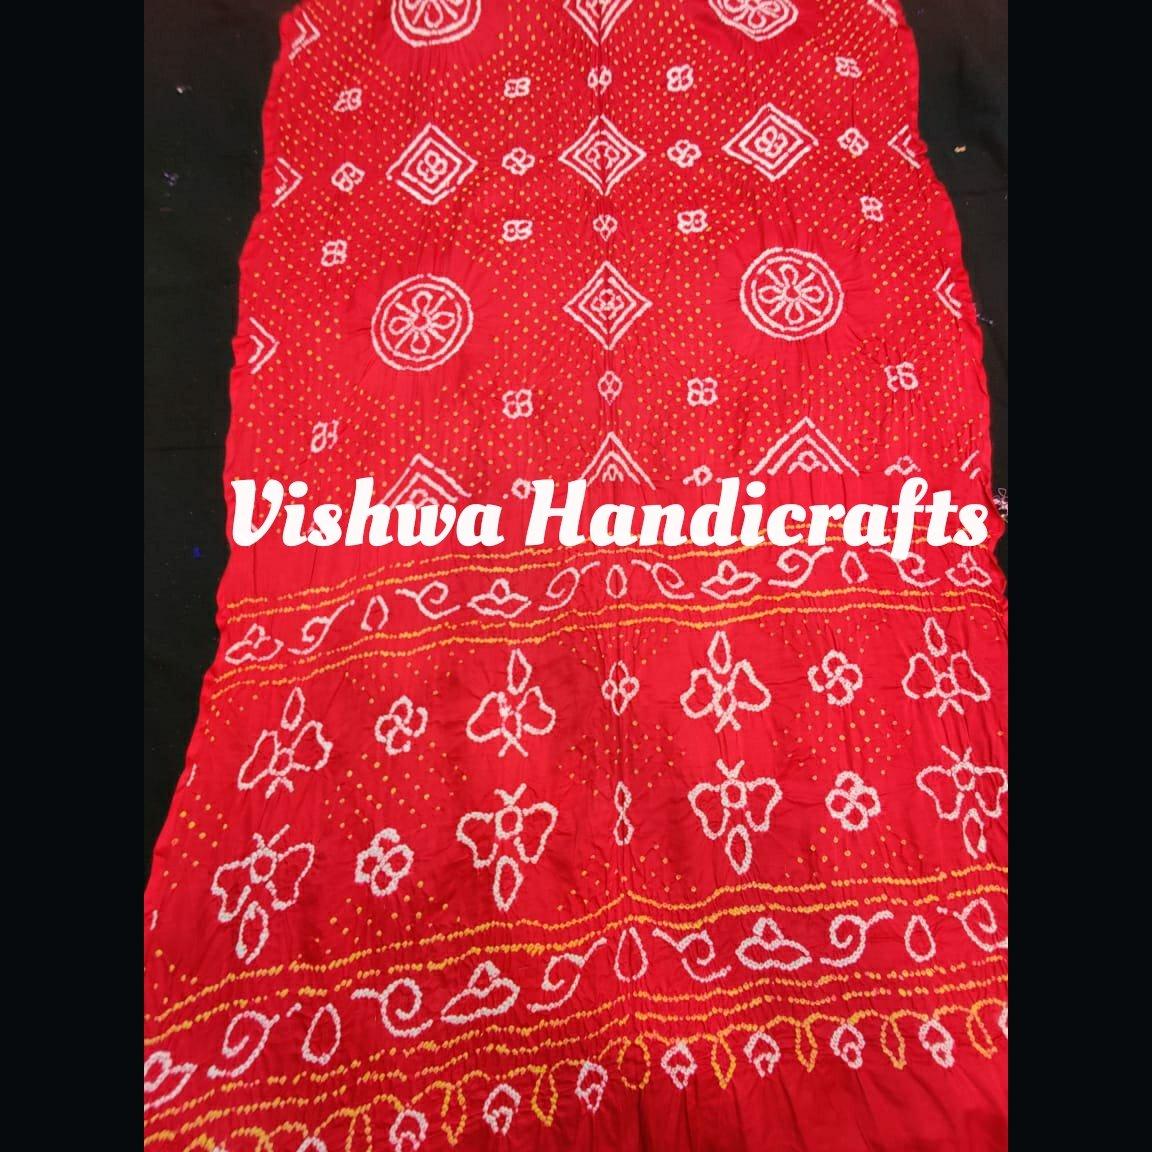 Pure gaji silk bandhej saree. #puregajisilksaree #bandhej #saree #vishwahandicrafts #onlineshopping #designersaree #followforfollow #vocalforvocal #fashion #handmade #Handcrafted #artisaninspiration #traditional #smallbusiness #unique #gajichat